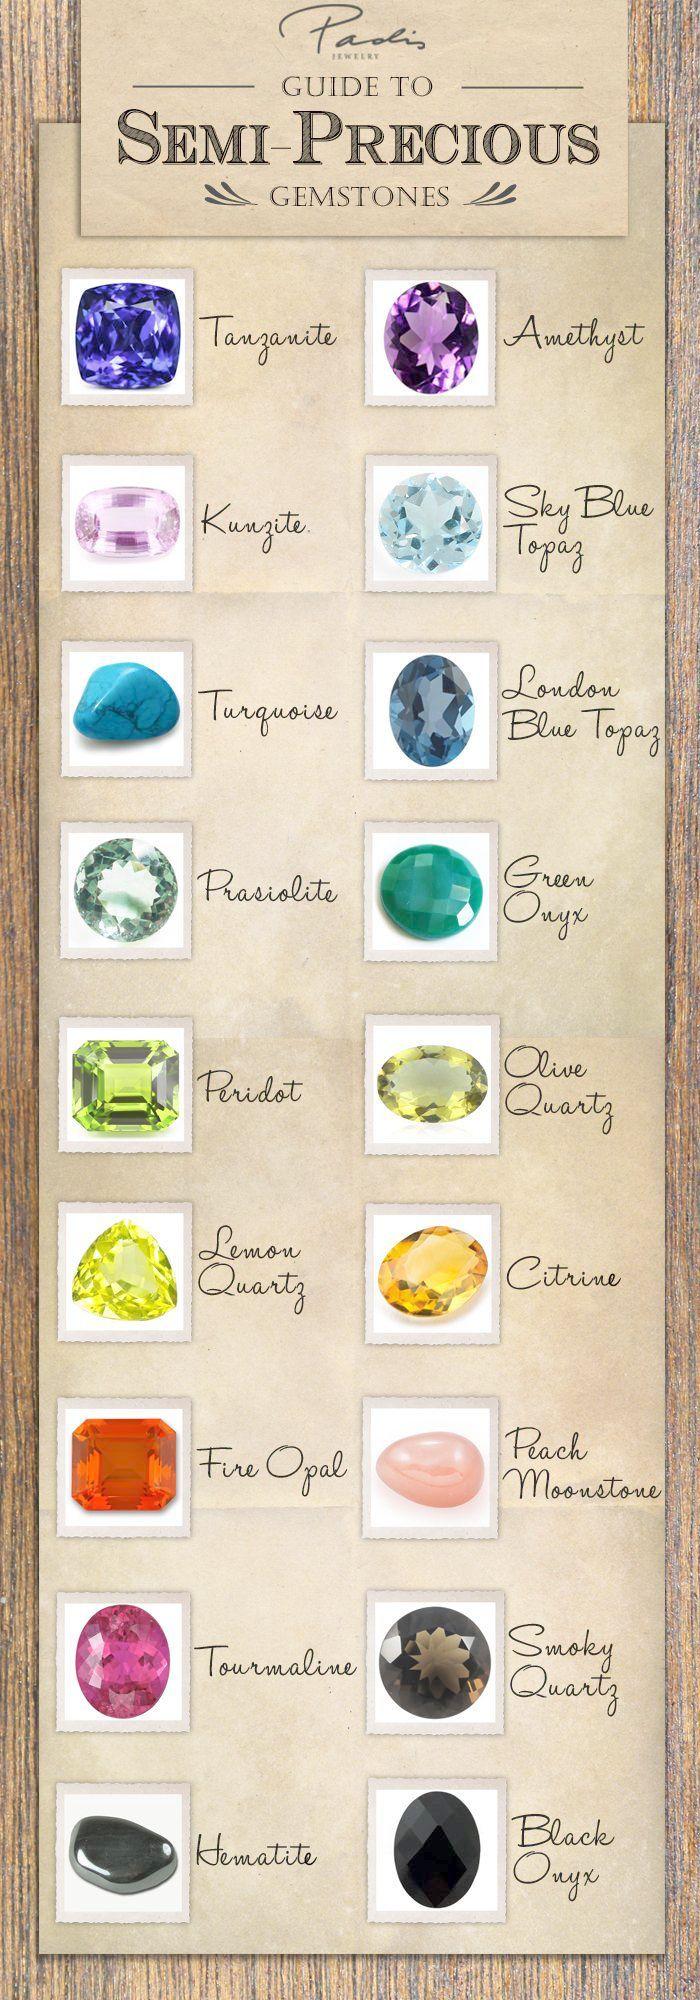 Diamond Jewellery Set Designs Most Gold Diamond Jewellery Designs Catalogue Gemstones Semi Precious Gemstones Stone Jewelry